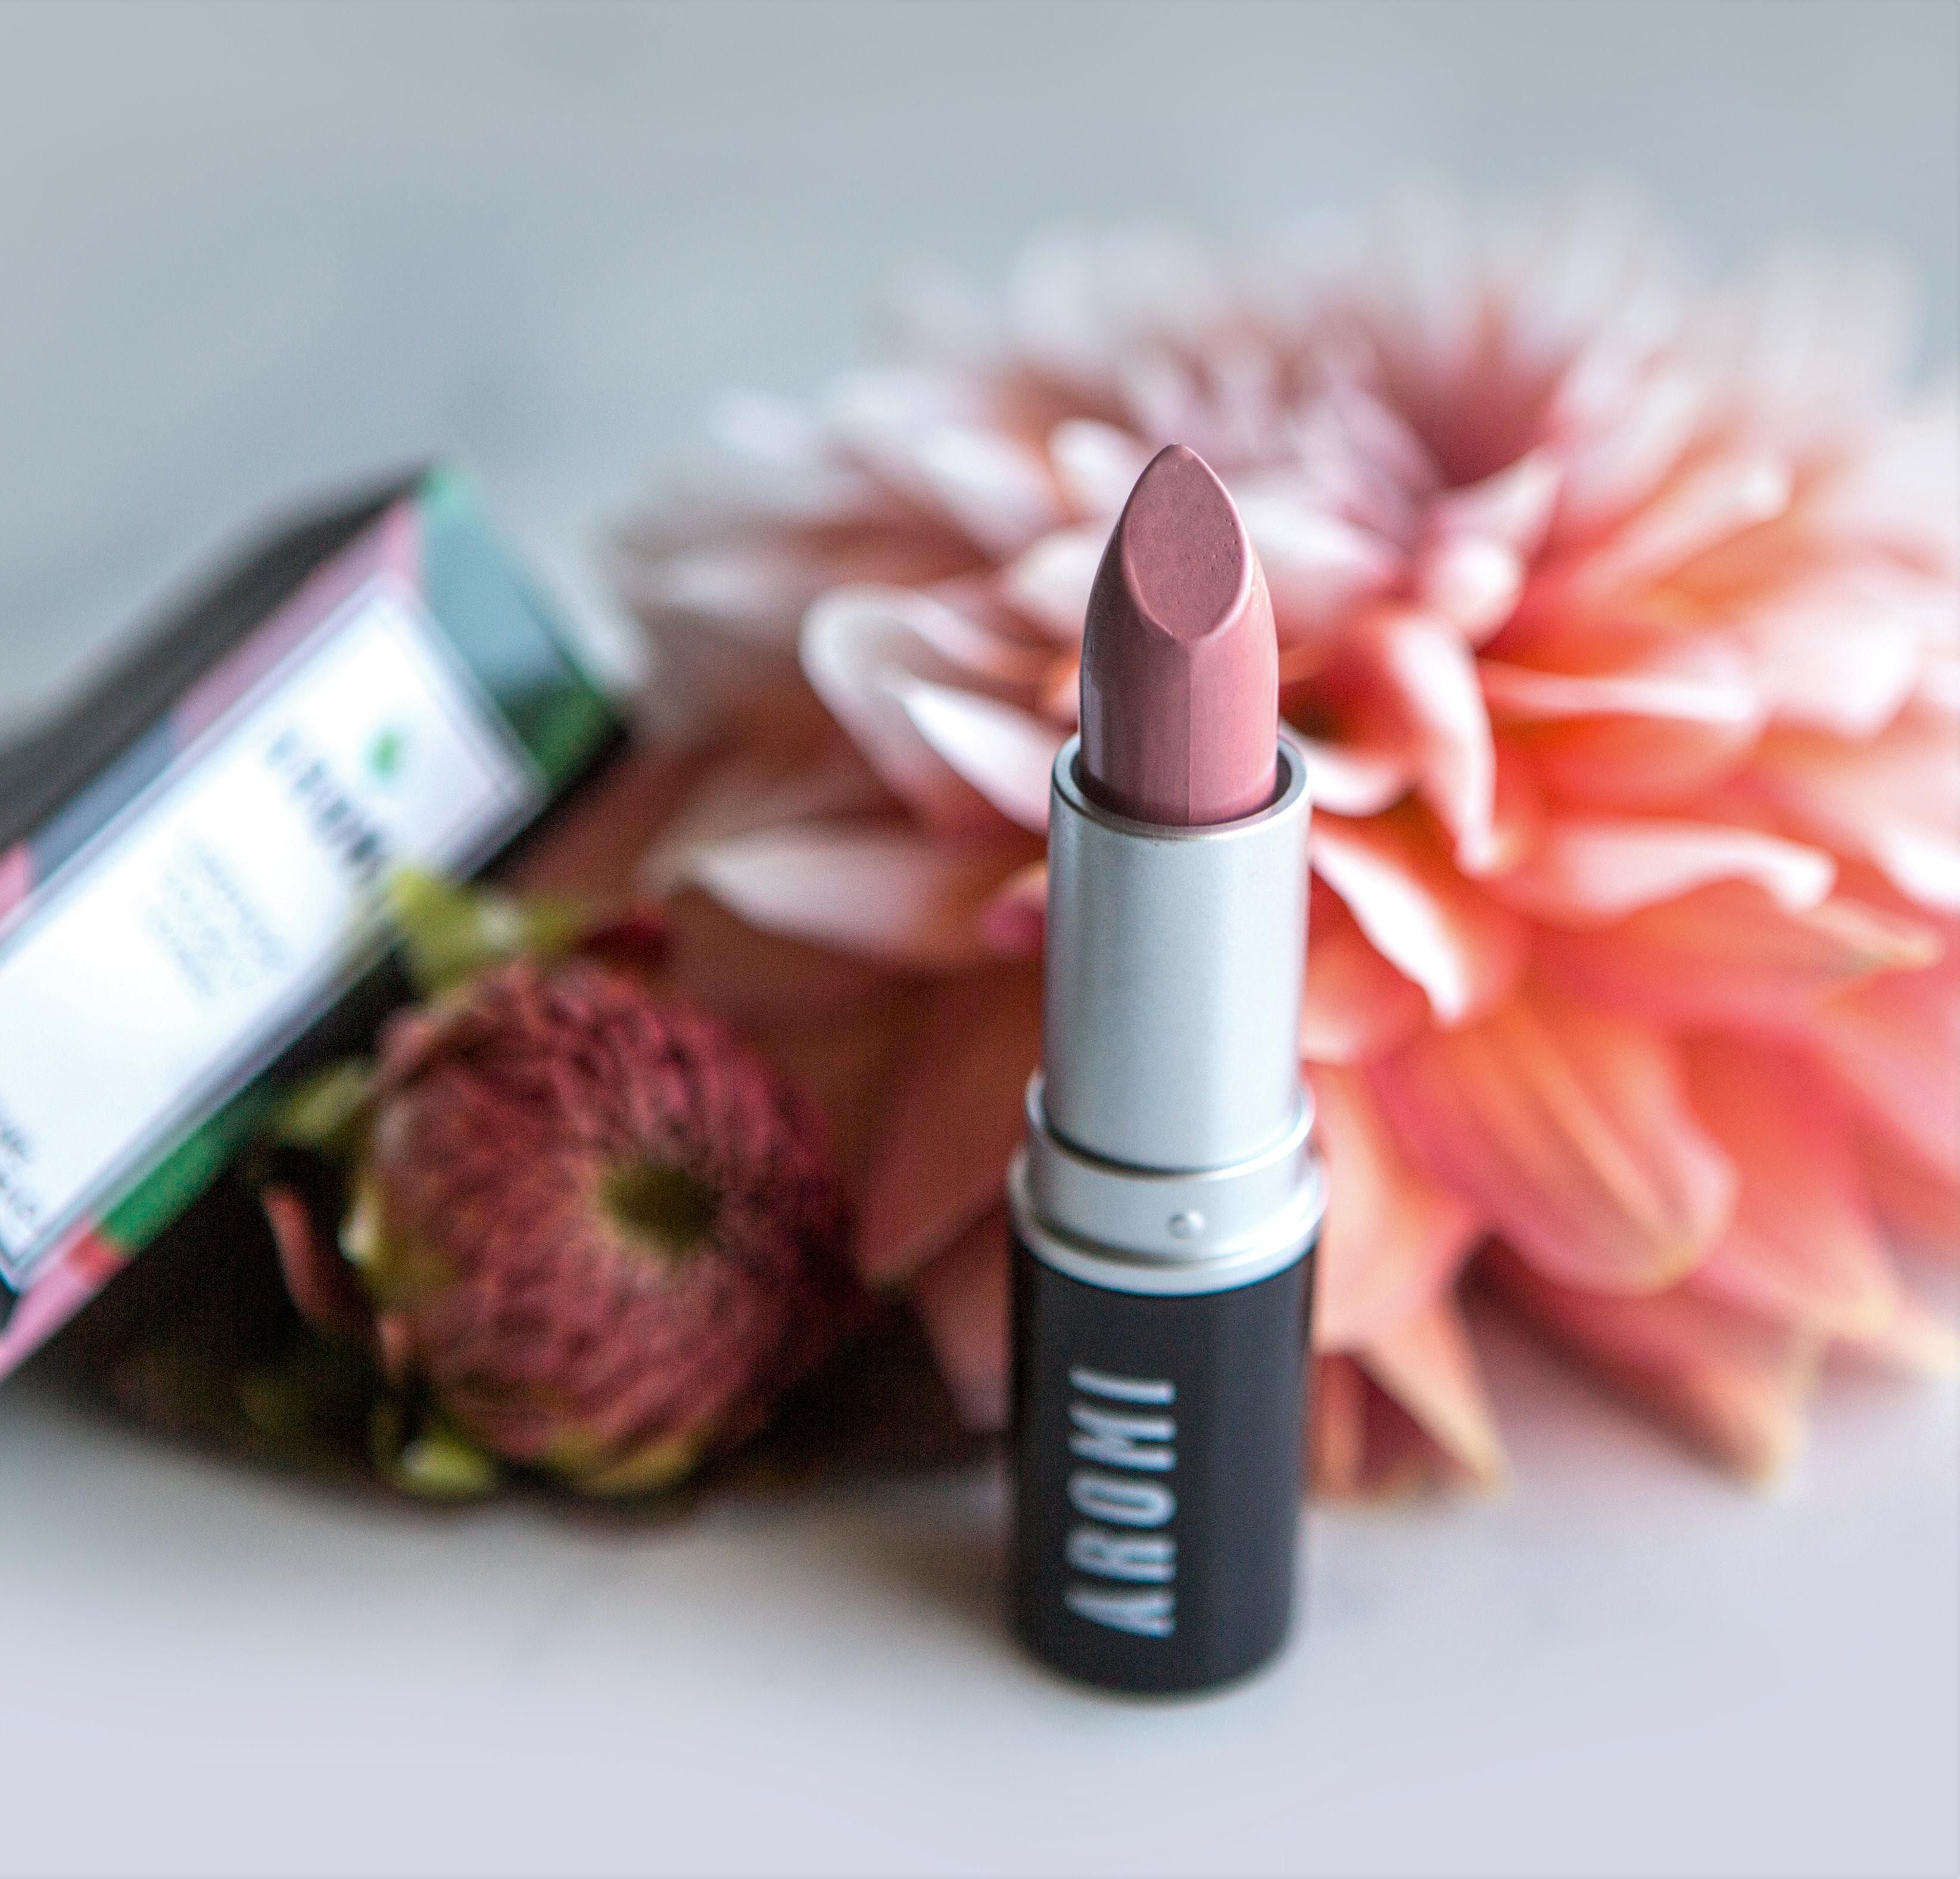 Aromi Rosy Nude Lipstick